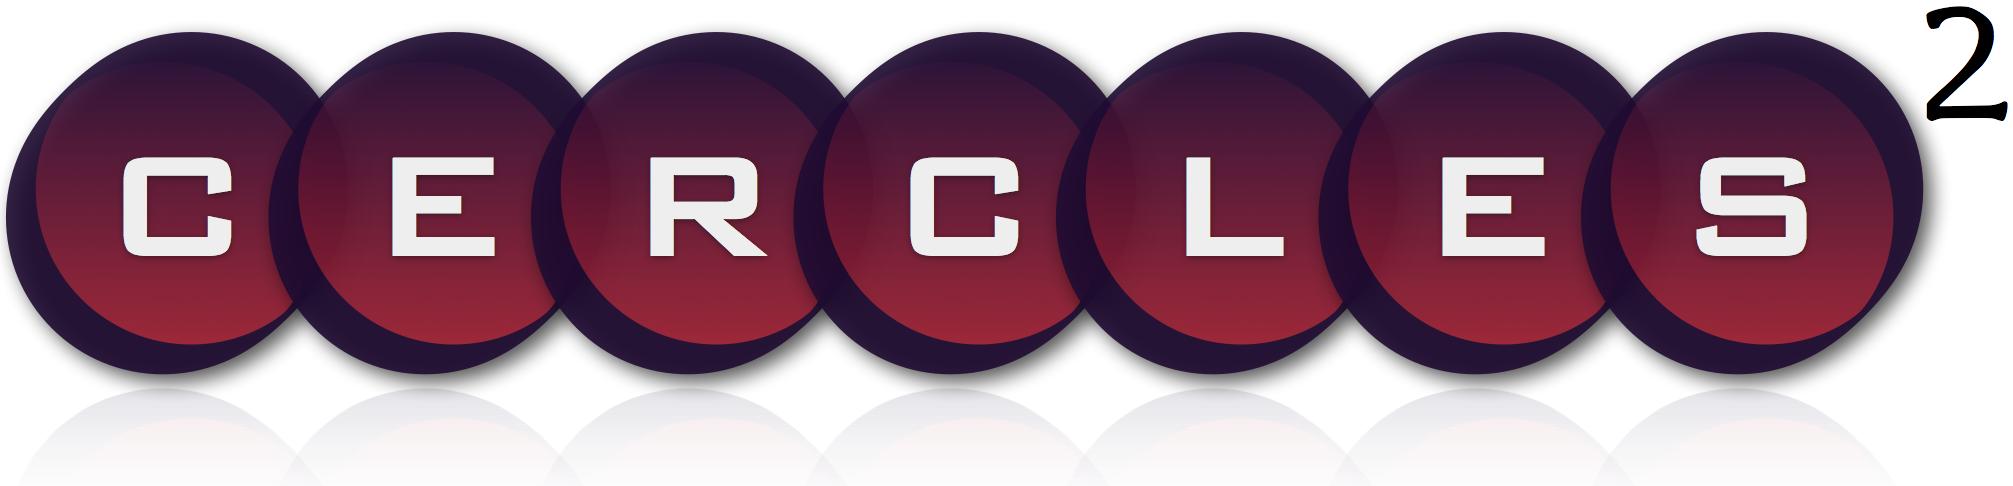 CERCLES (logo)